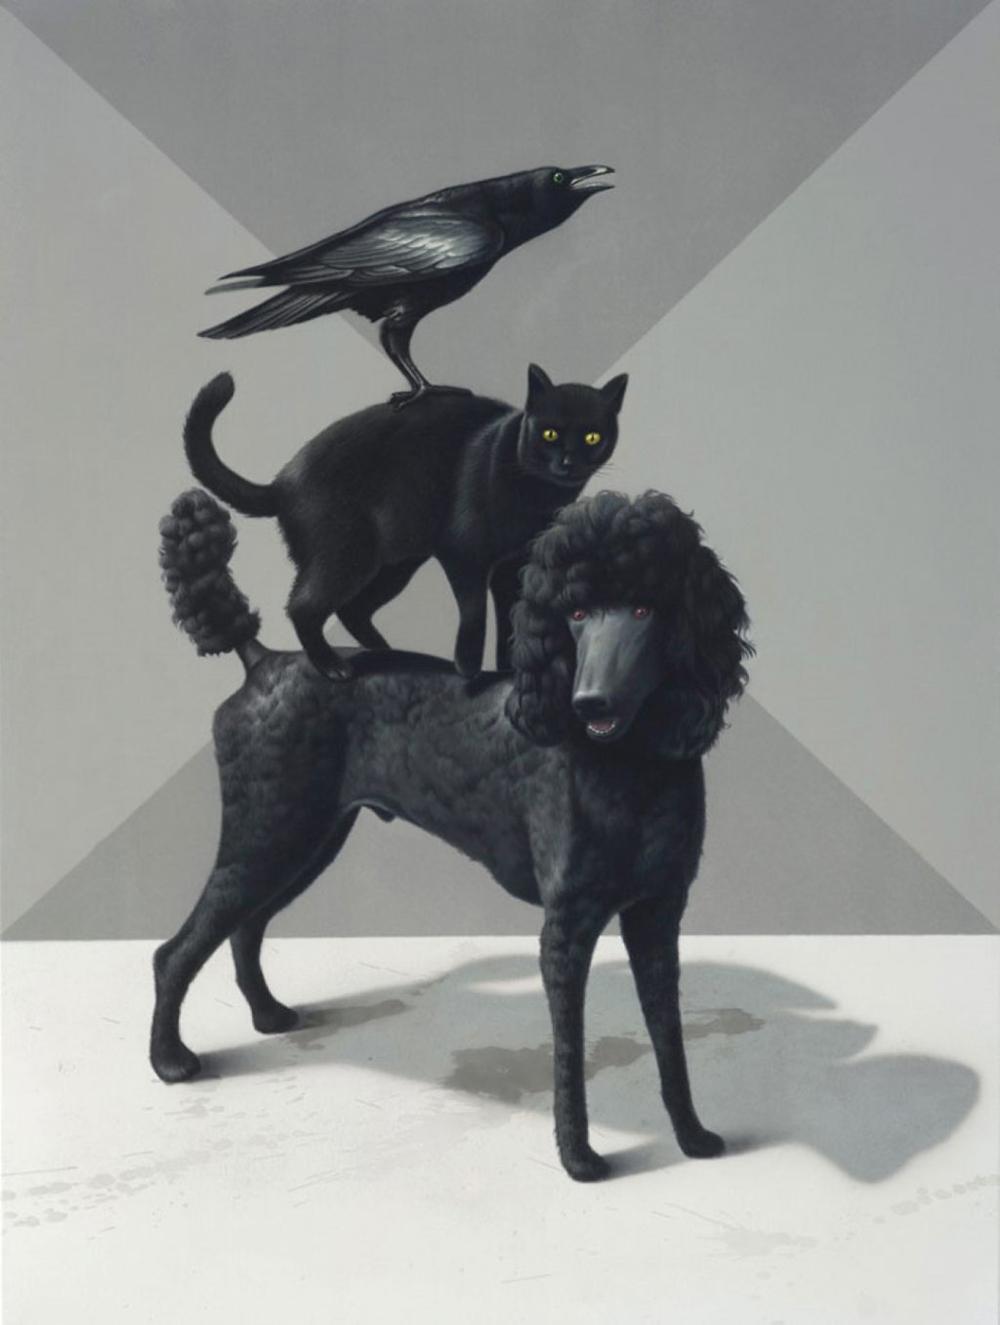 """Life as a curious outsider"": An Interview with Artist Eckart Hahn"